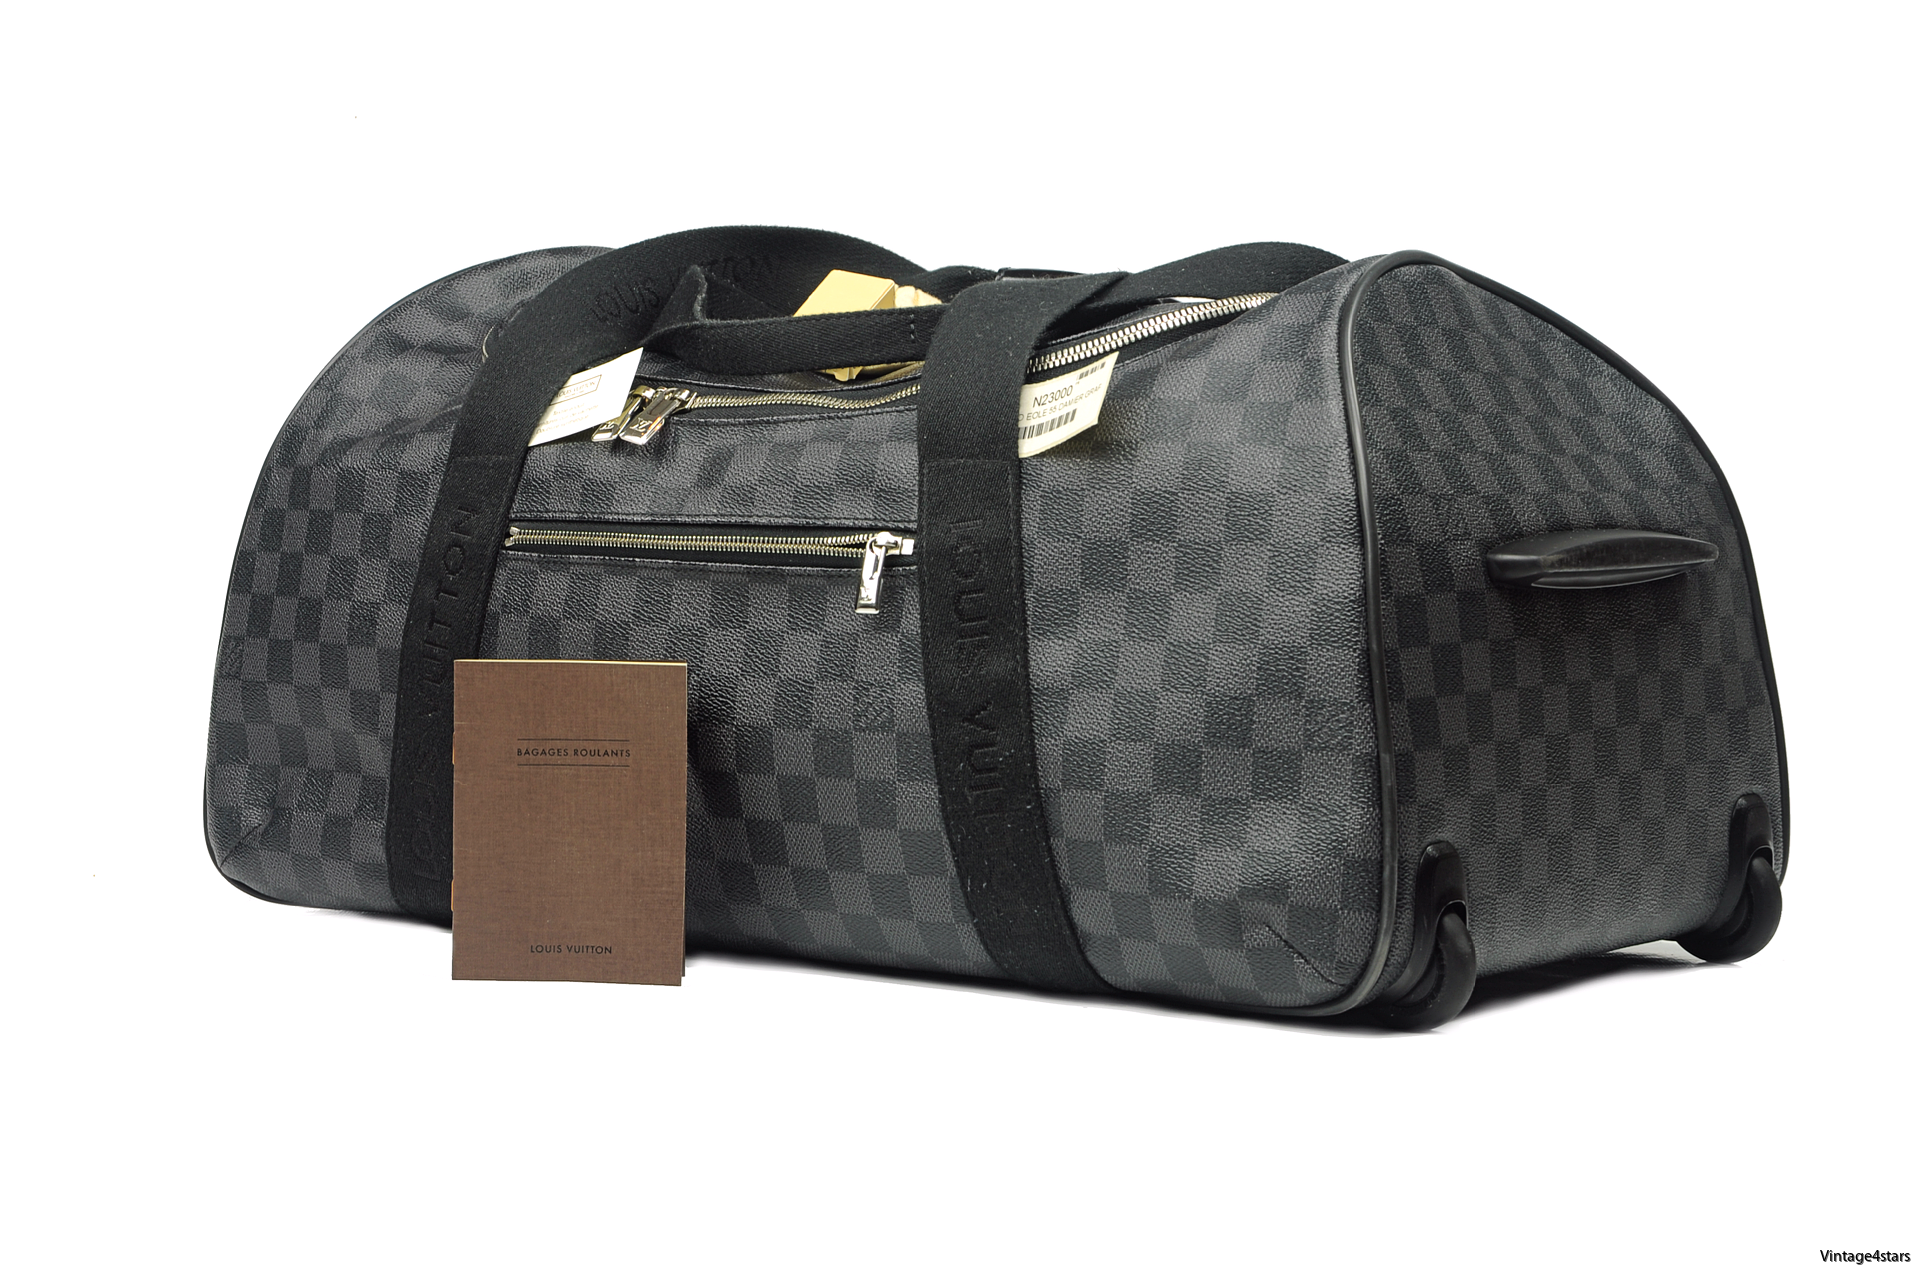 Louis Vuitton Eole 55 NEO Graphite 2